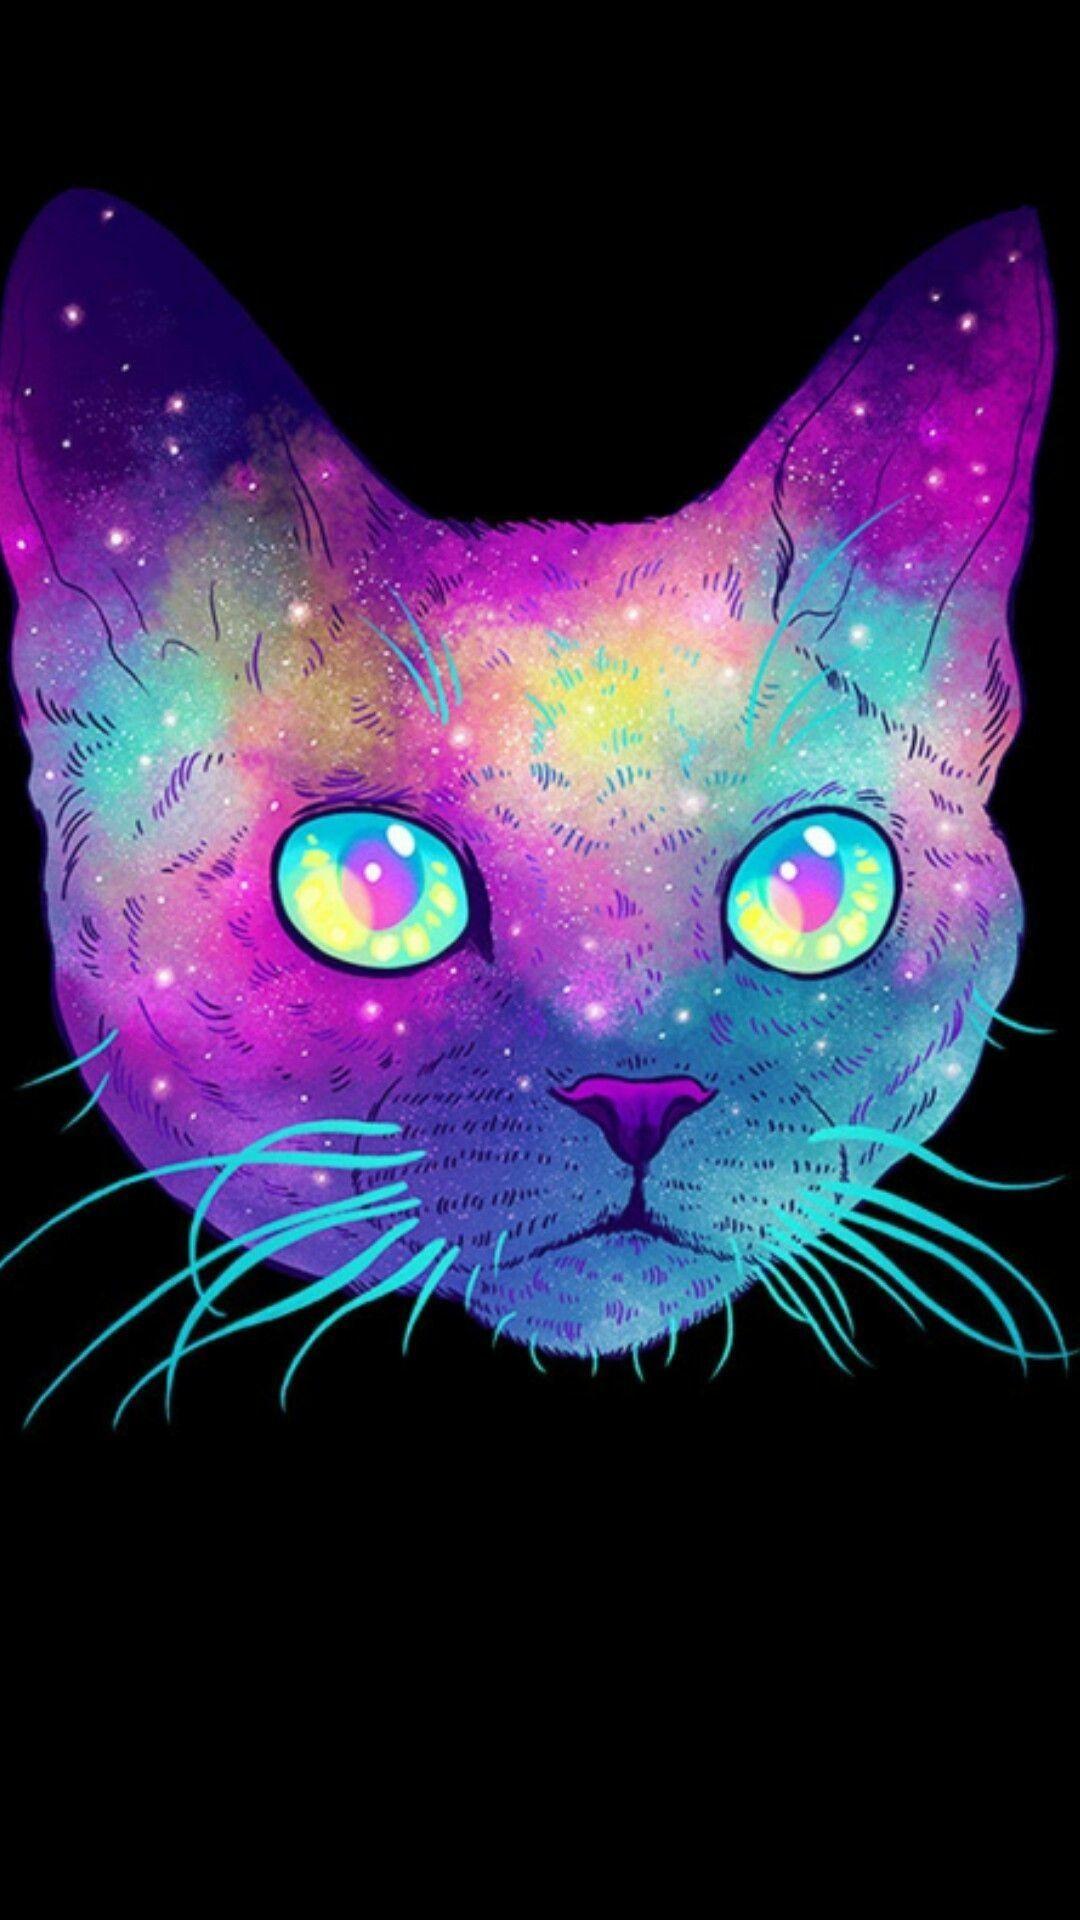 Cheshire Cat Alice In Wonderland Background Image